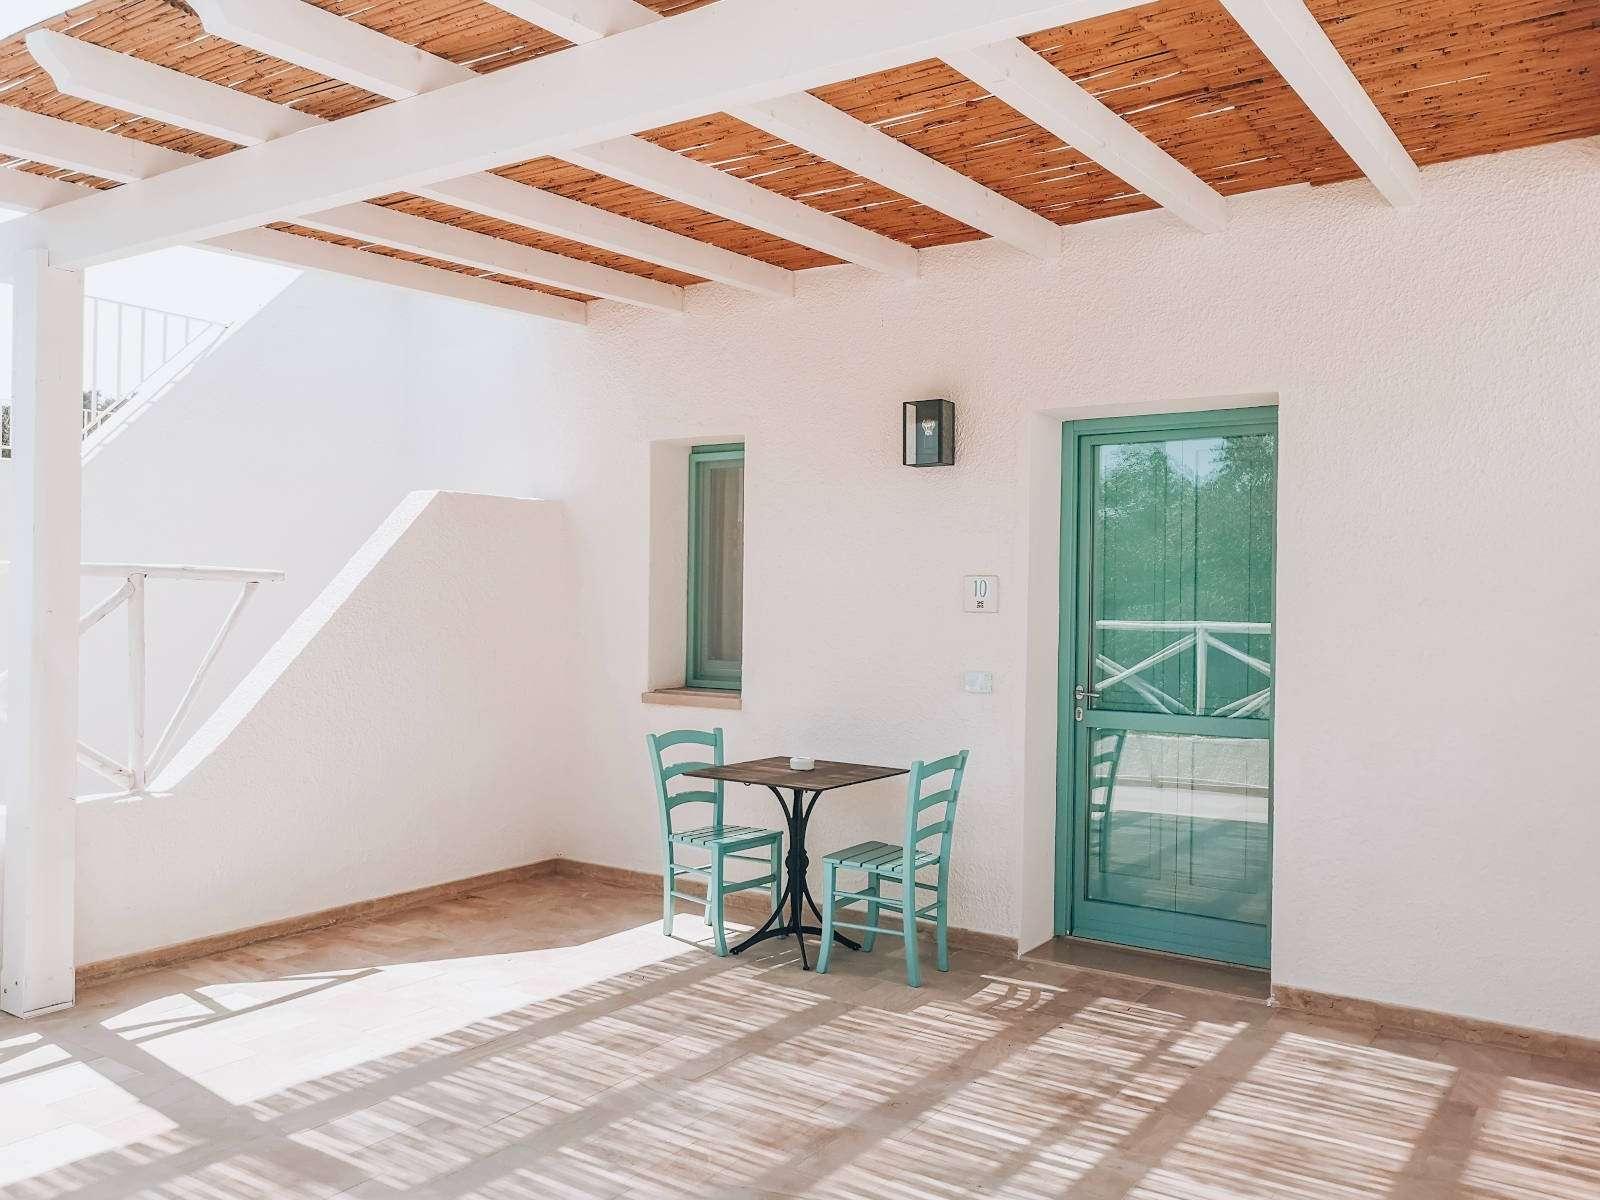 marenea suite hotel - puglia - italie - overdekt terras